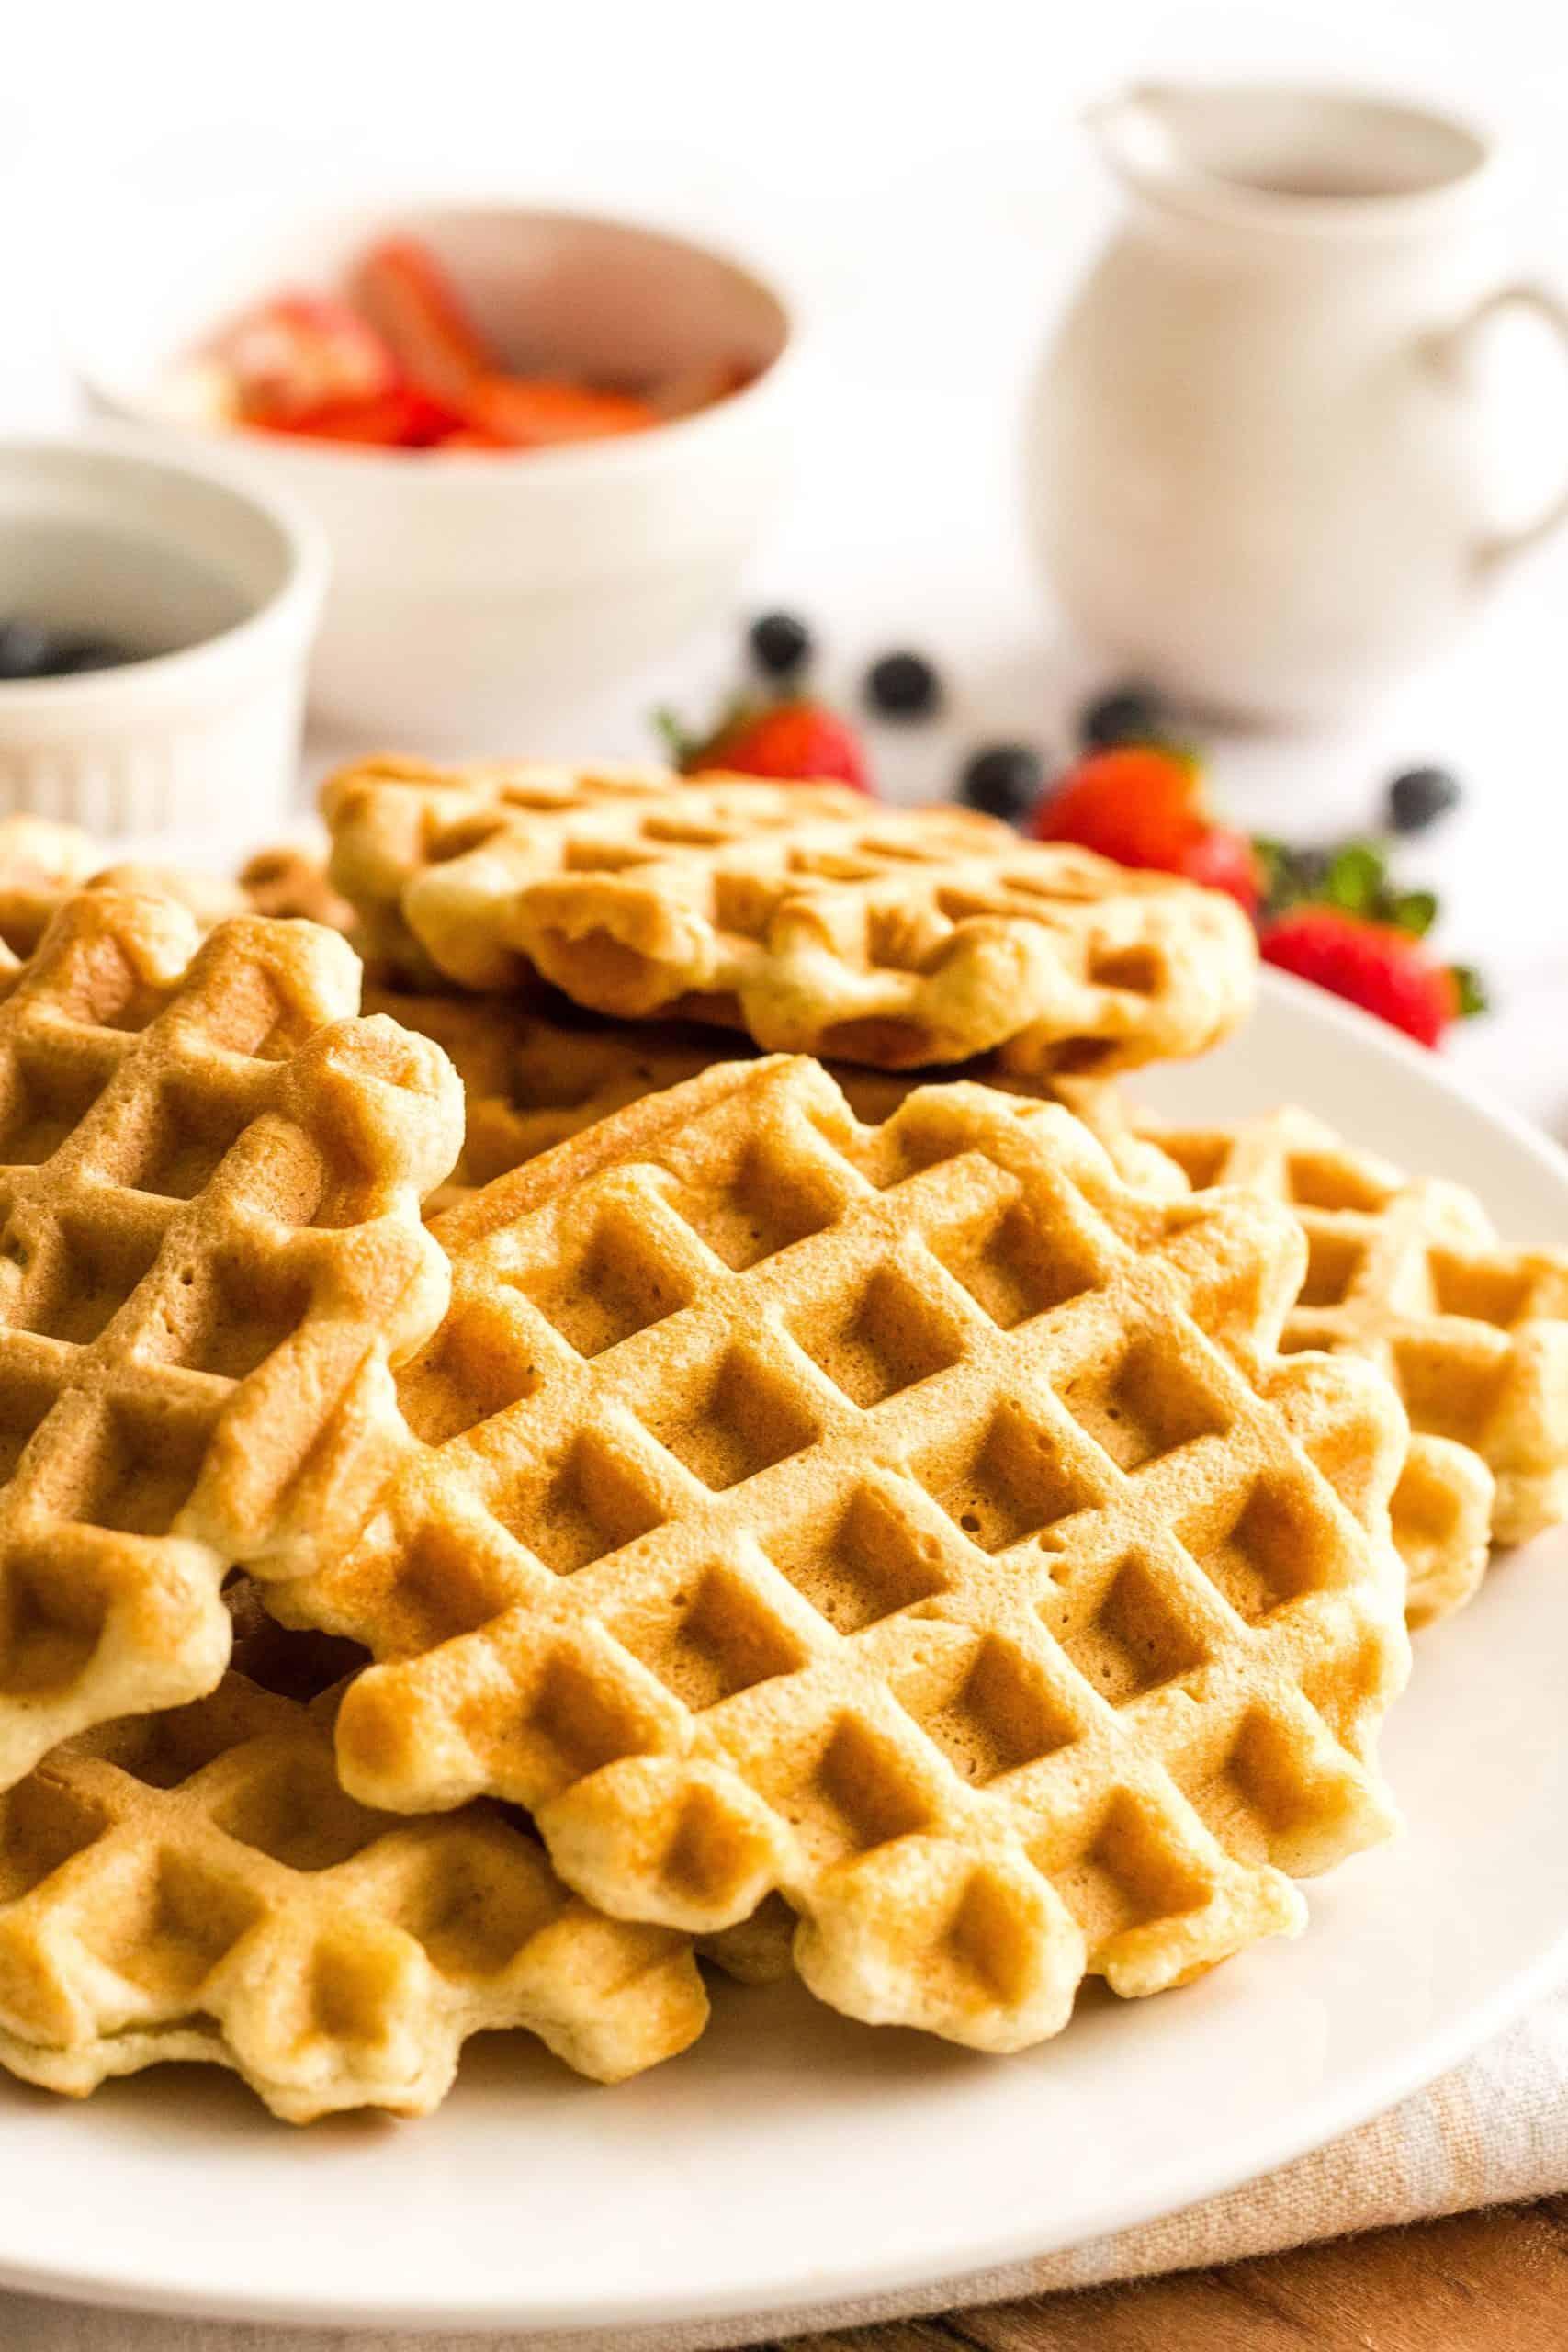 A plate full of homemade gluten-free waffles.